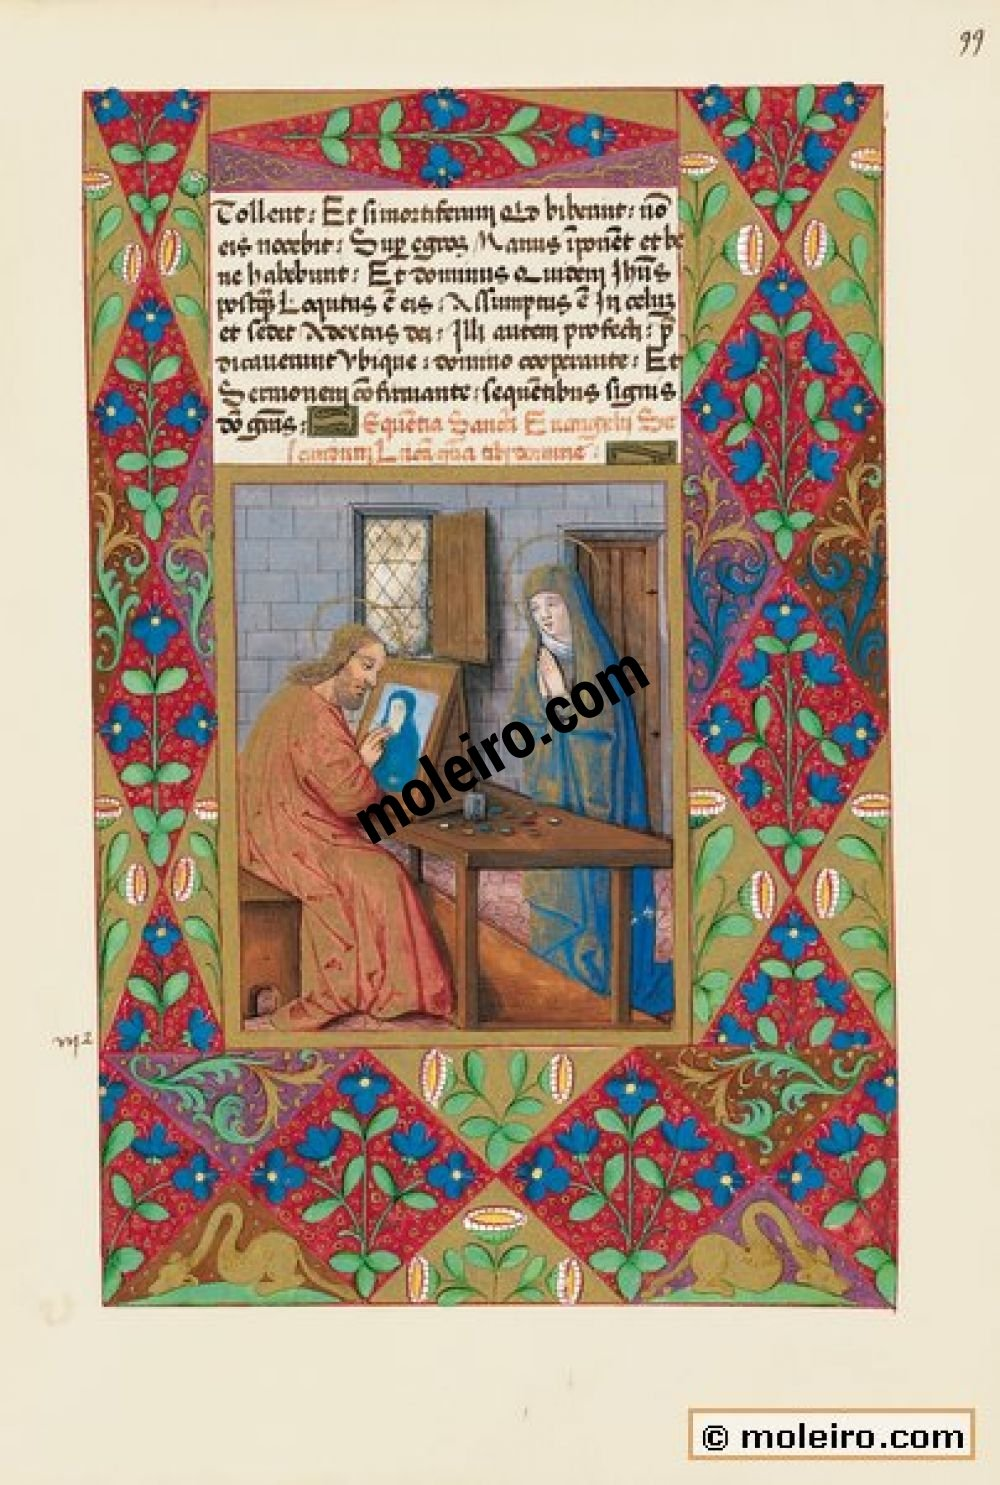 Libro de Horas de Luis de Orleans  f. 99r, San Lucas